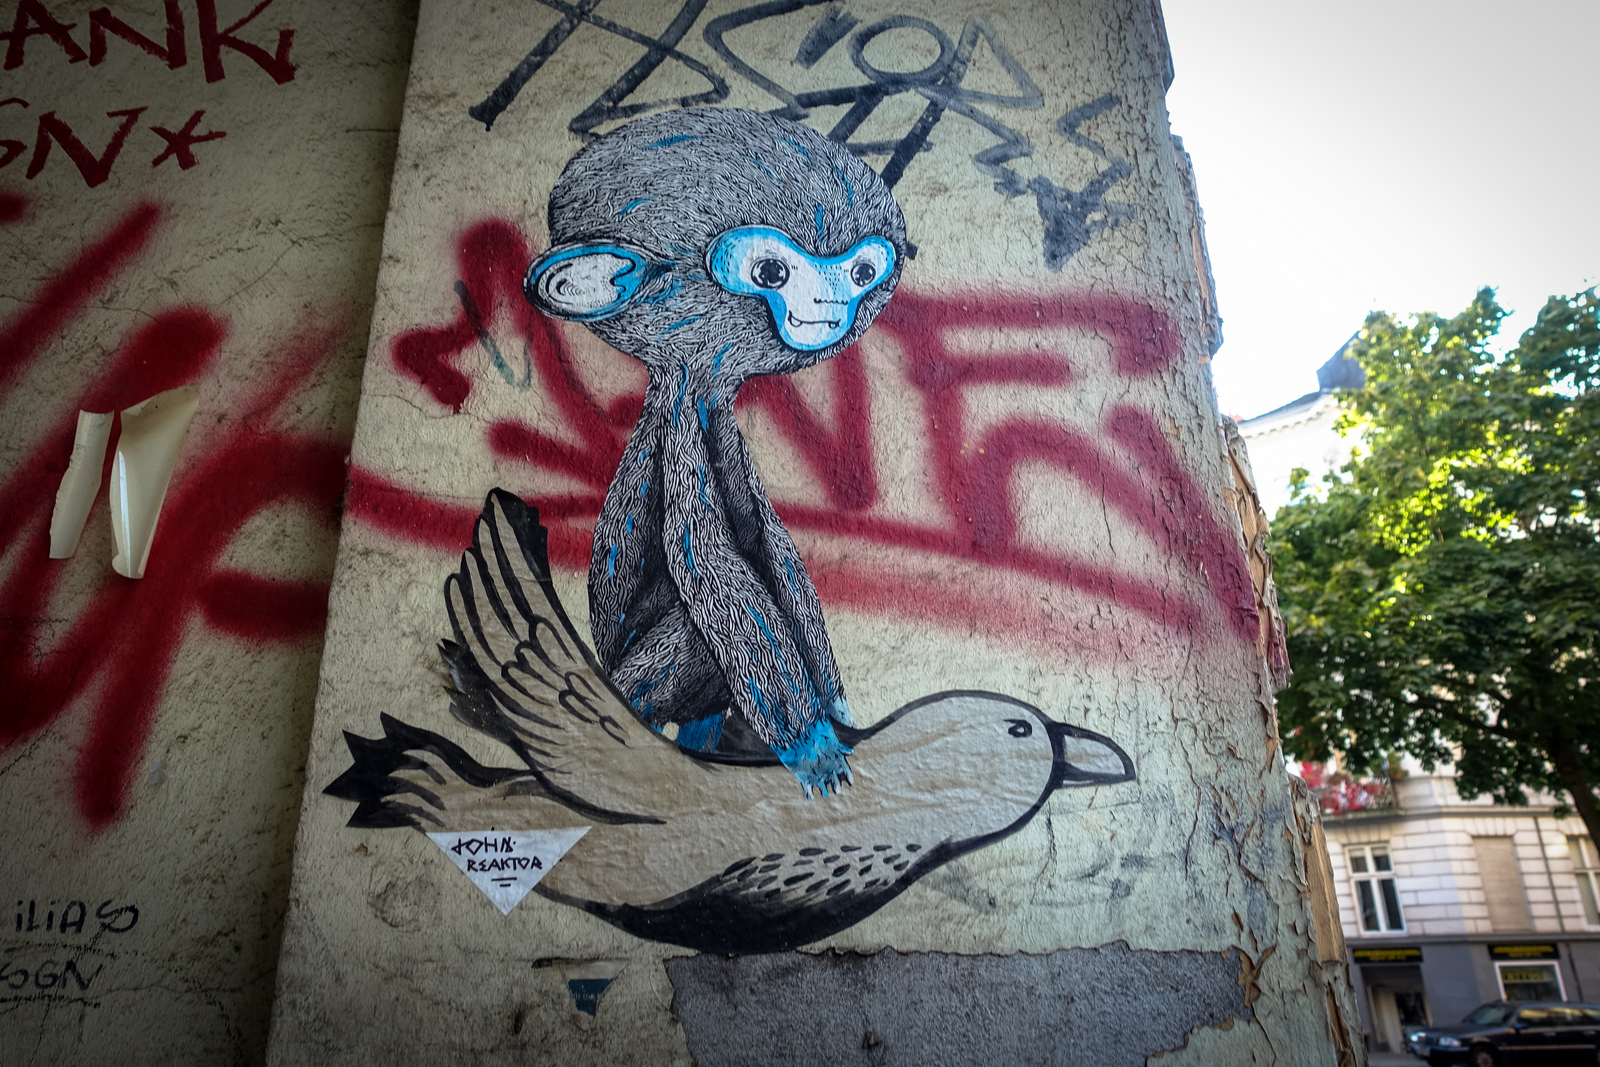 streetart in karoviertel hamburg, sept 2015 | URBANPRESENTS